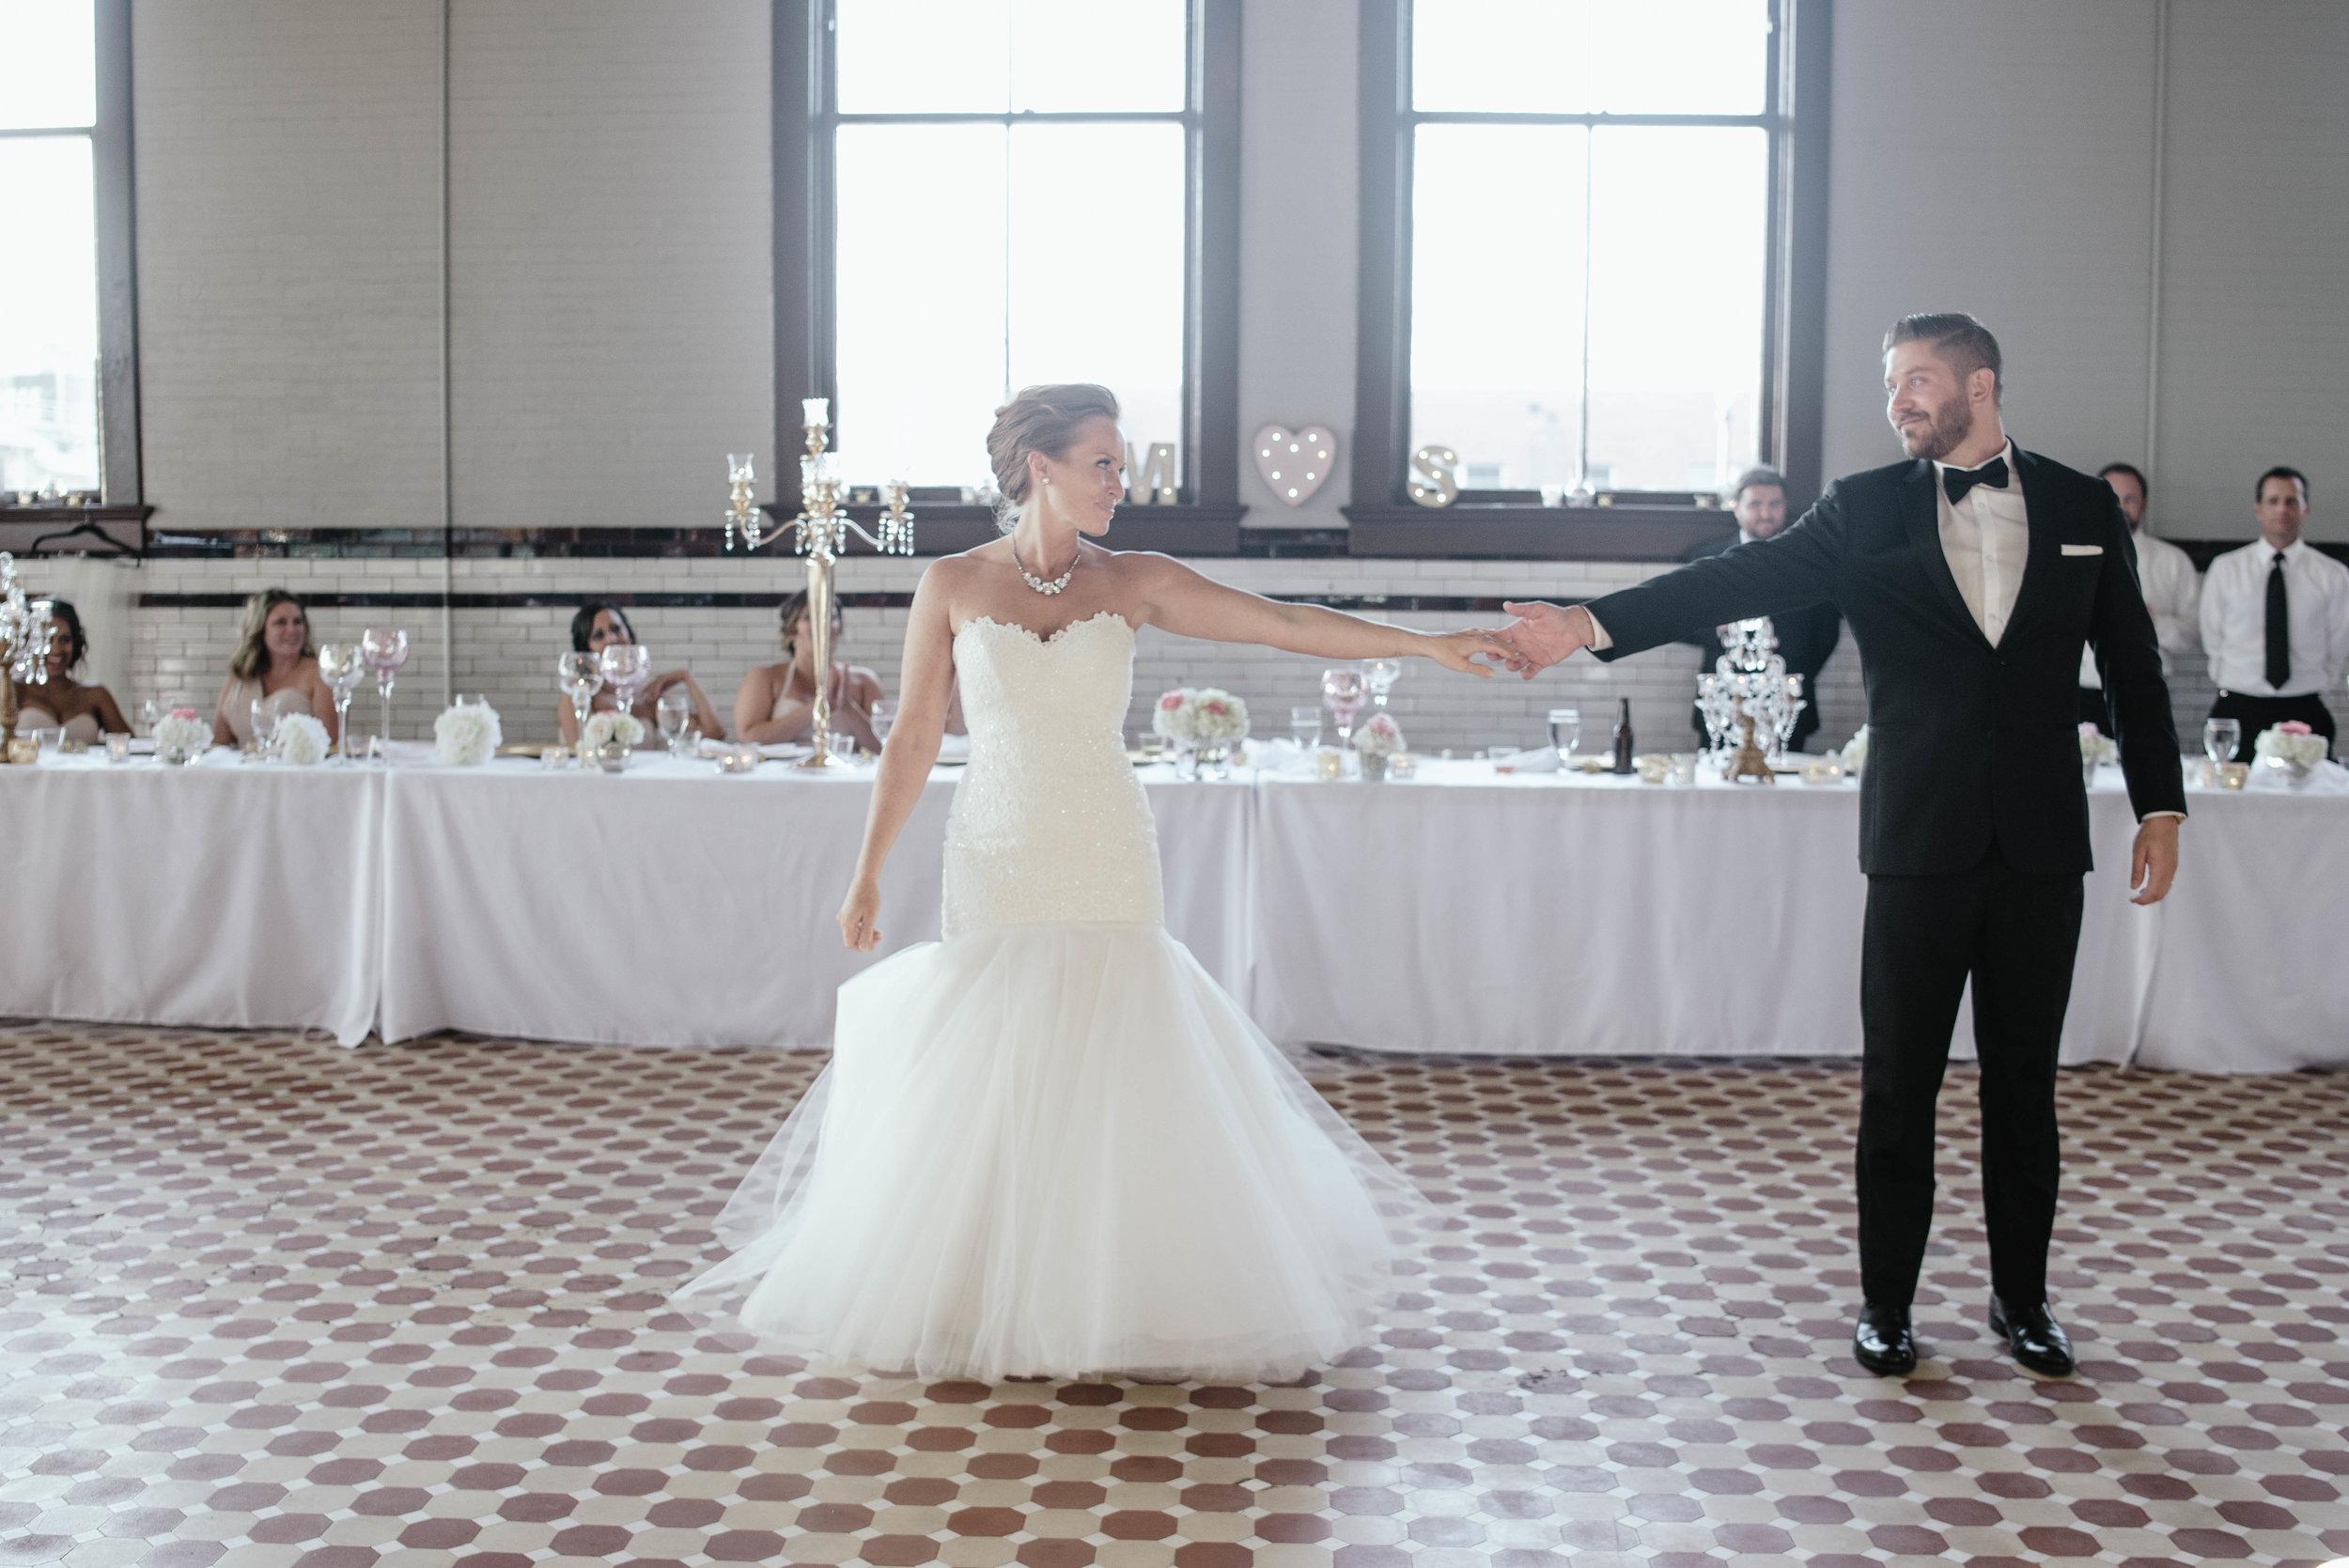 Mina-Steve-Blog-Indianapolis-Wedding-153.jpg